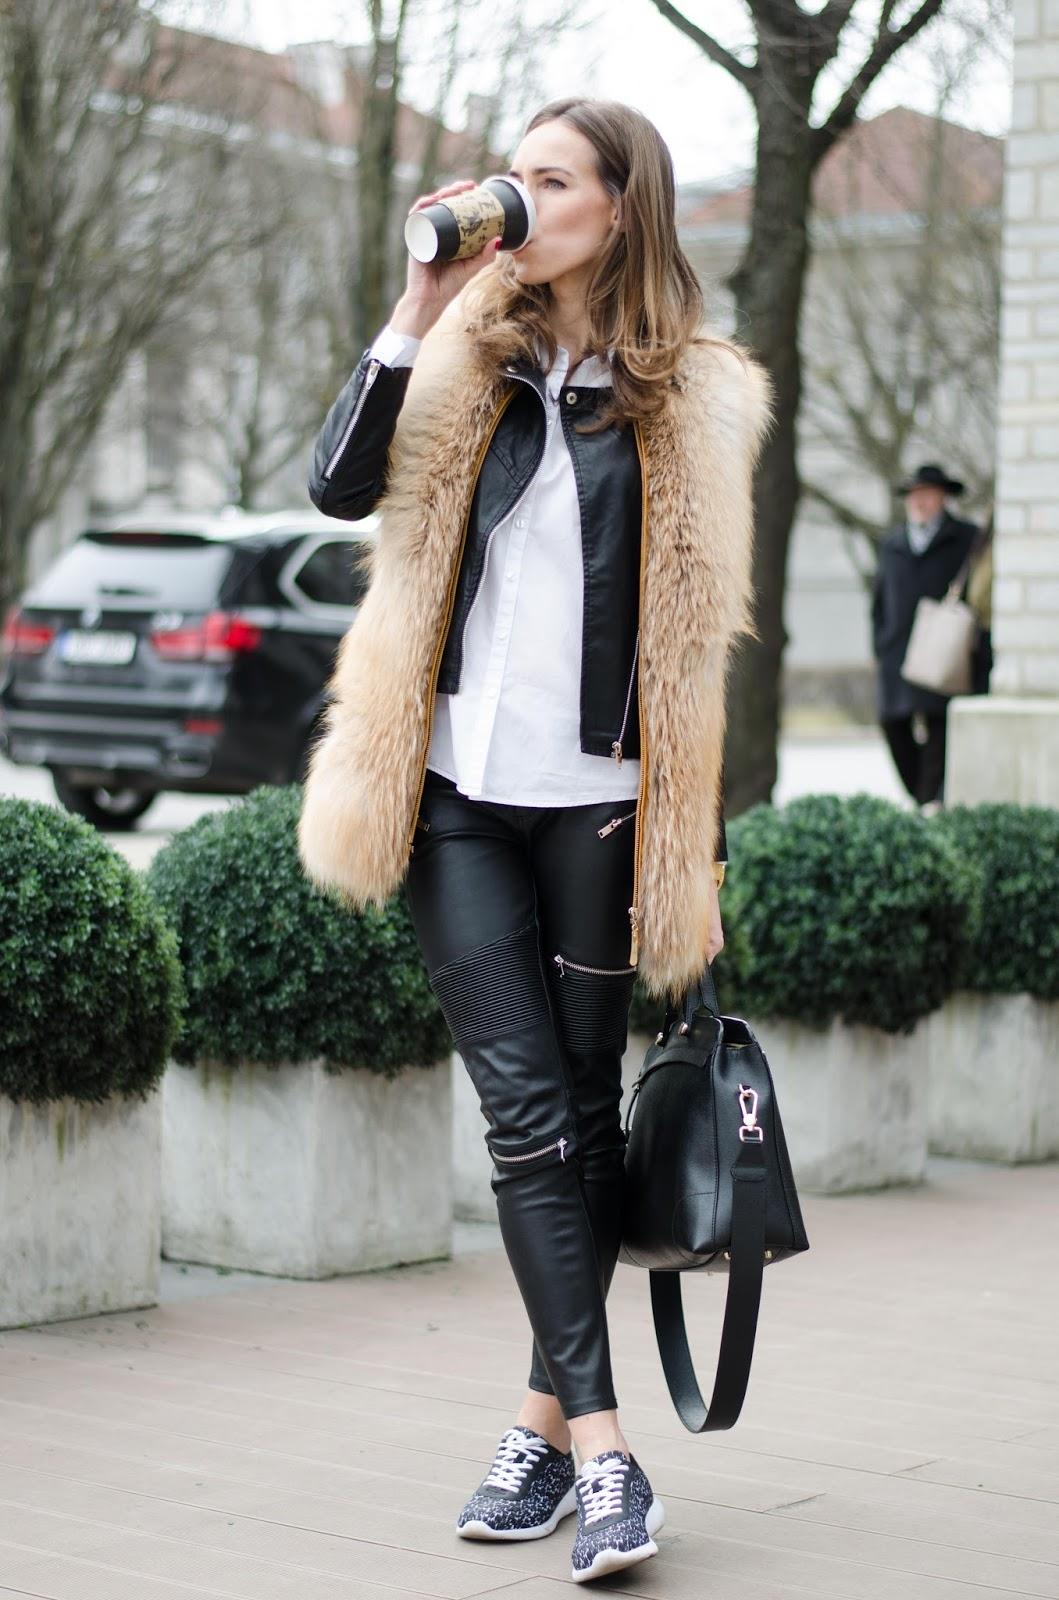 kristjaana mere fur vest leather pants sneakers outfit